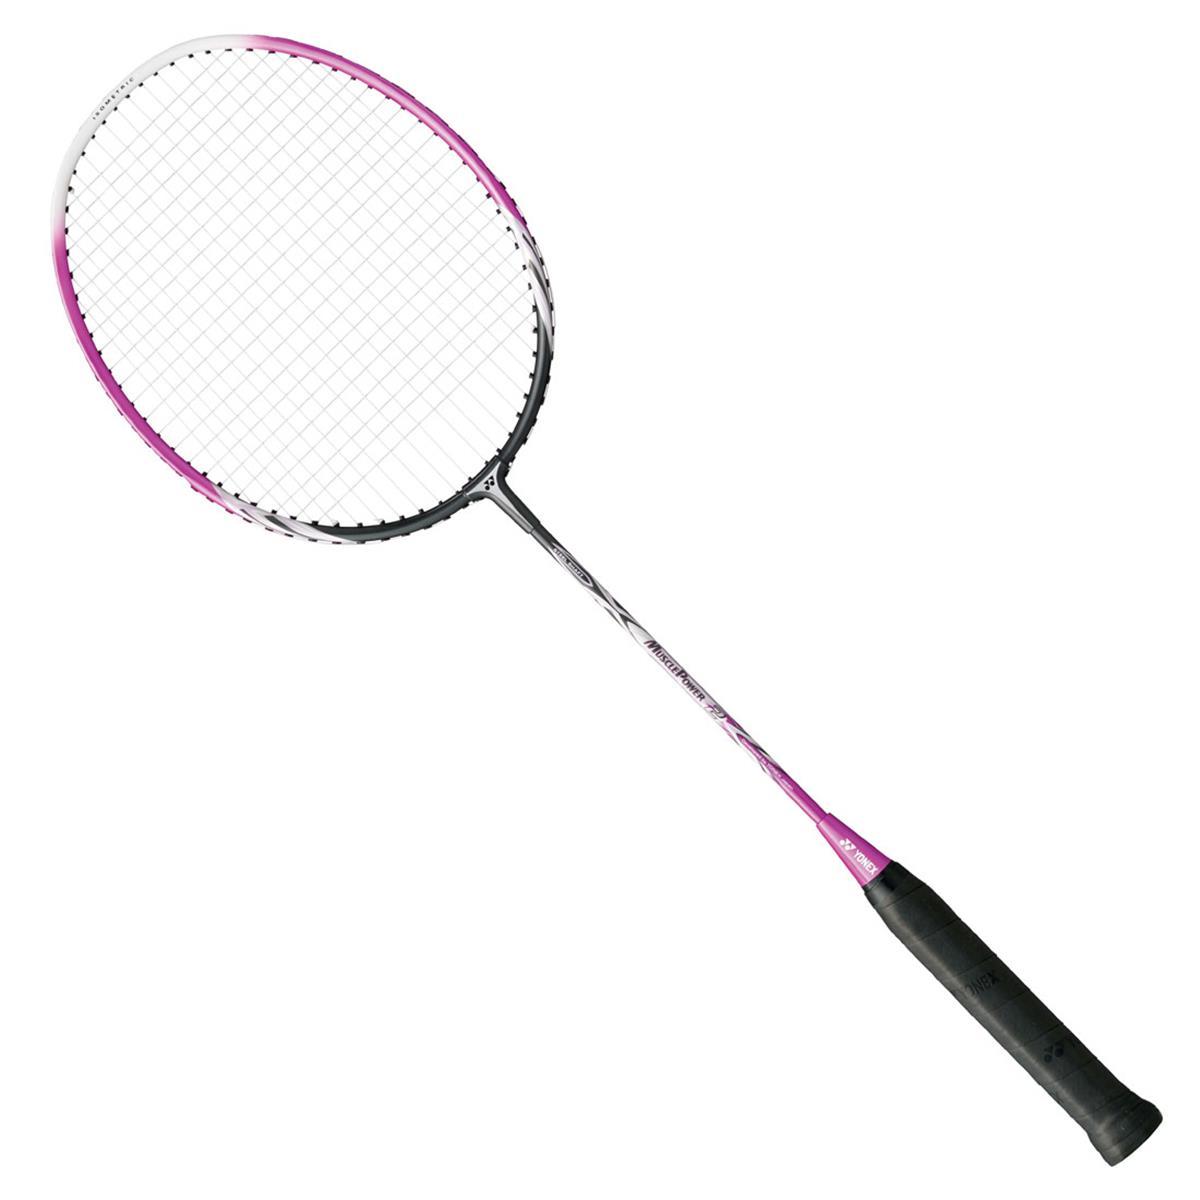 Yonex Muscle Power 2 Badminton Racket (Dark Gun-Pink ...